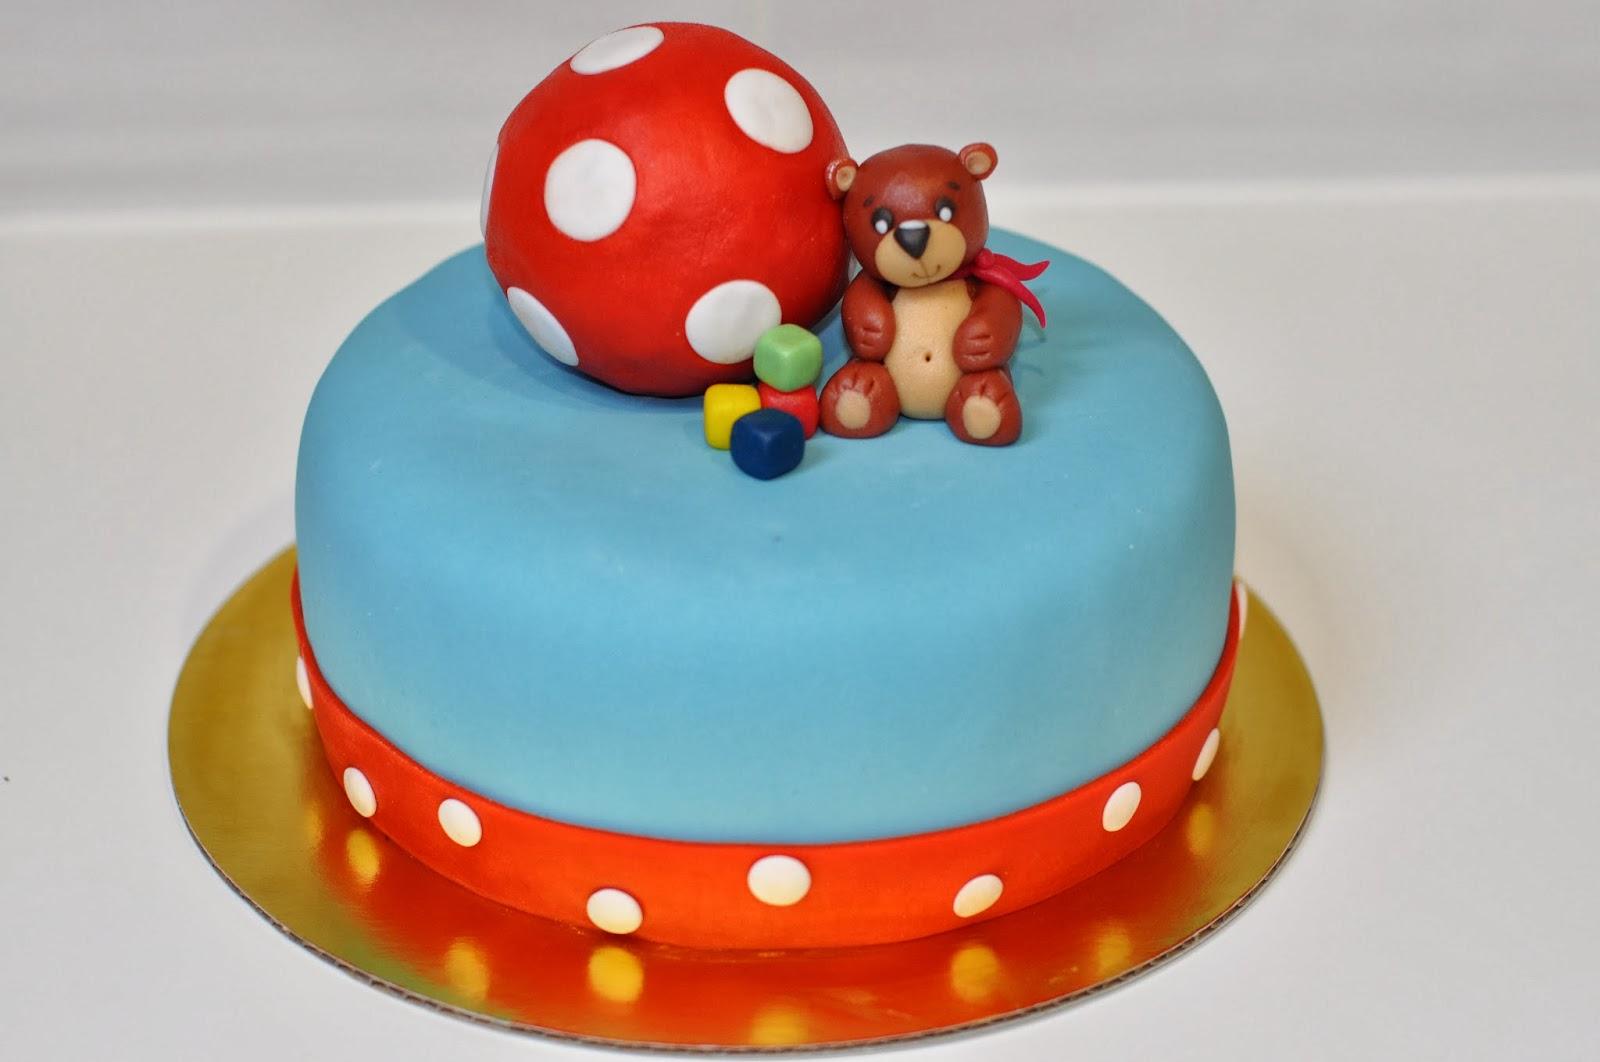 torta képek gyerekeknek SAVANYÚCUKOR: Legigazibb gyerek torta : ) torta képek gyerekeknek